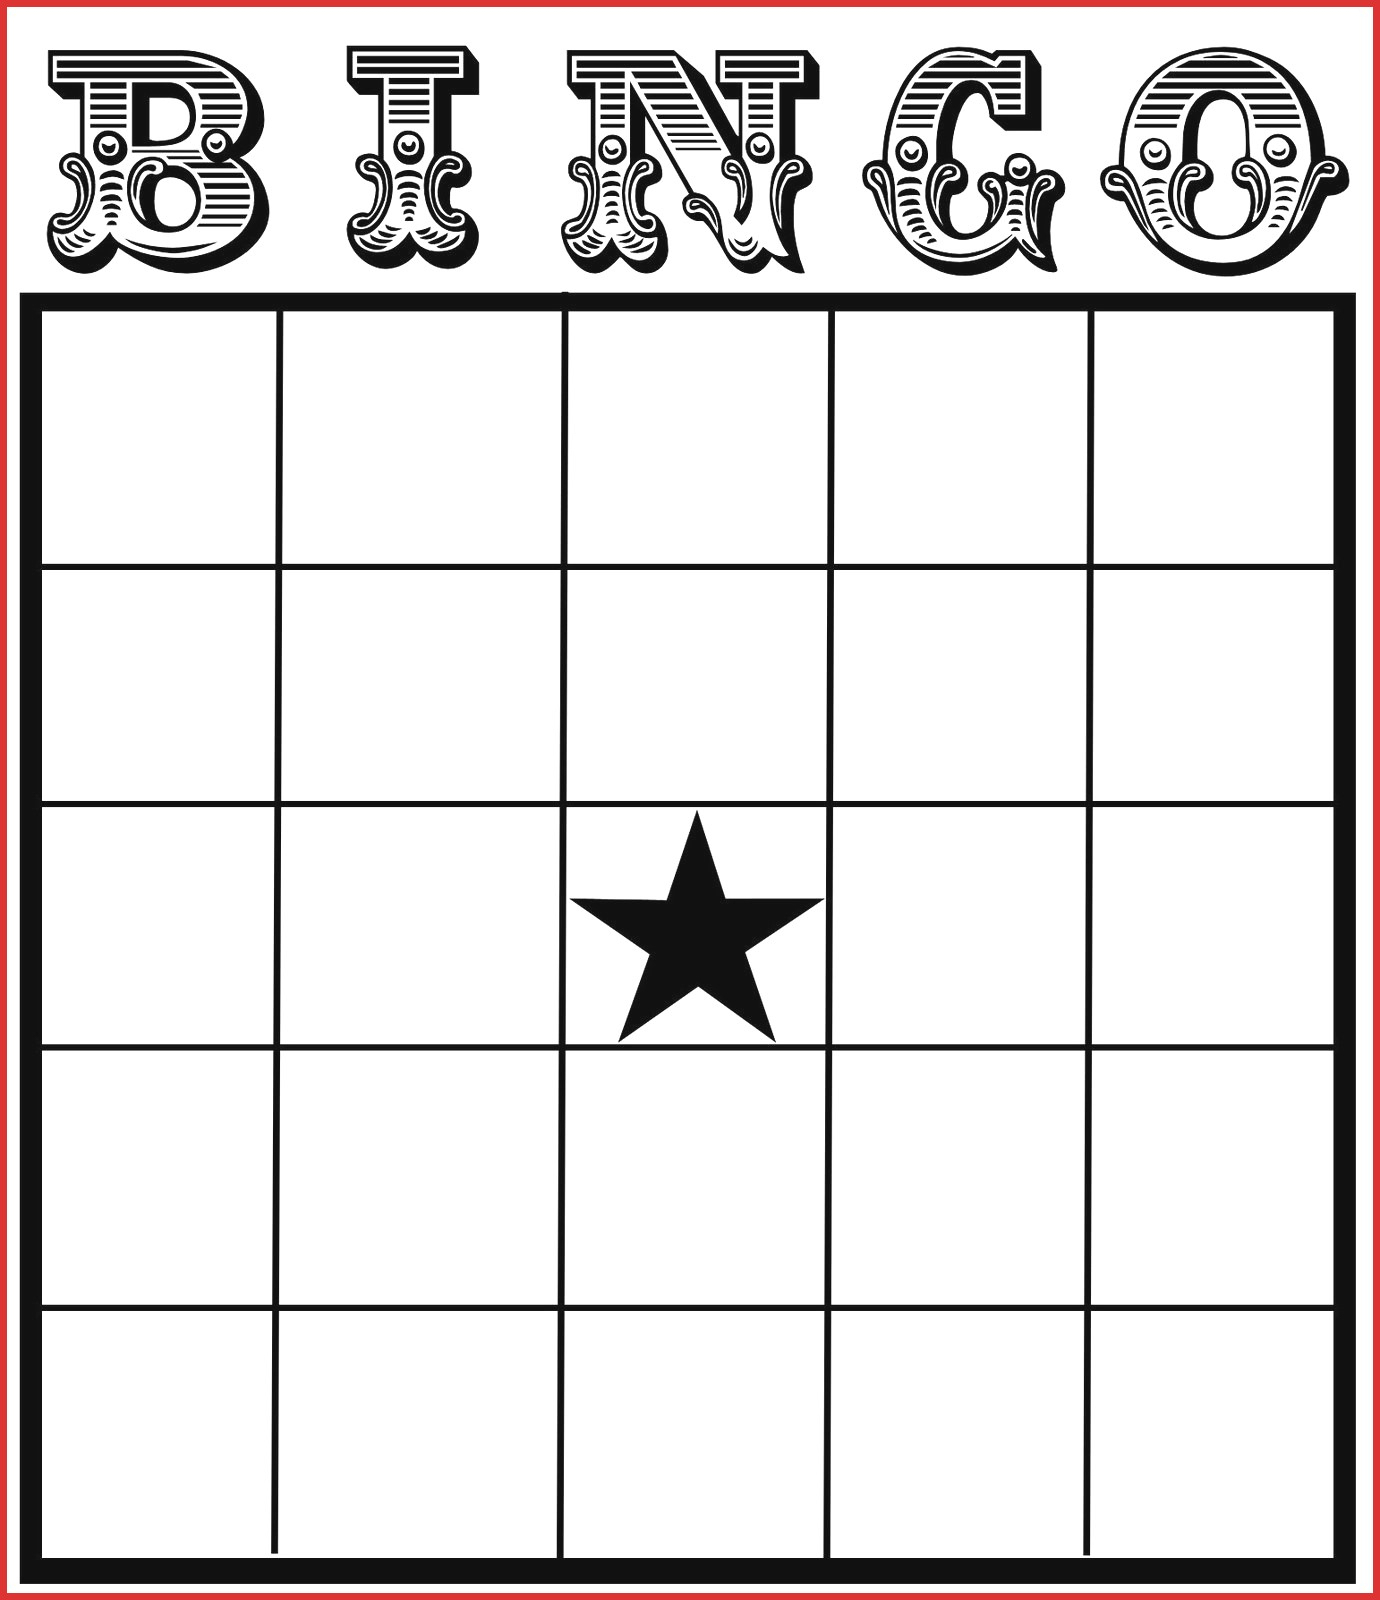 Bingo Card Template Word - Tomope.zaribanks.co